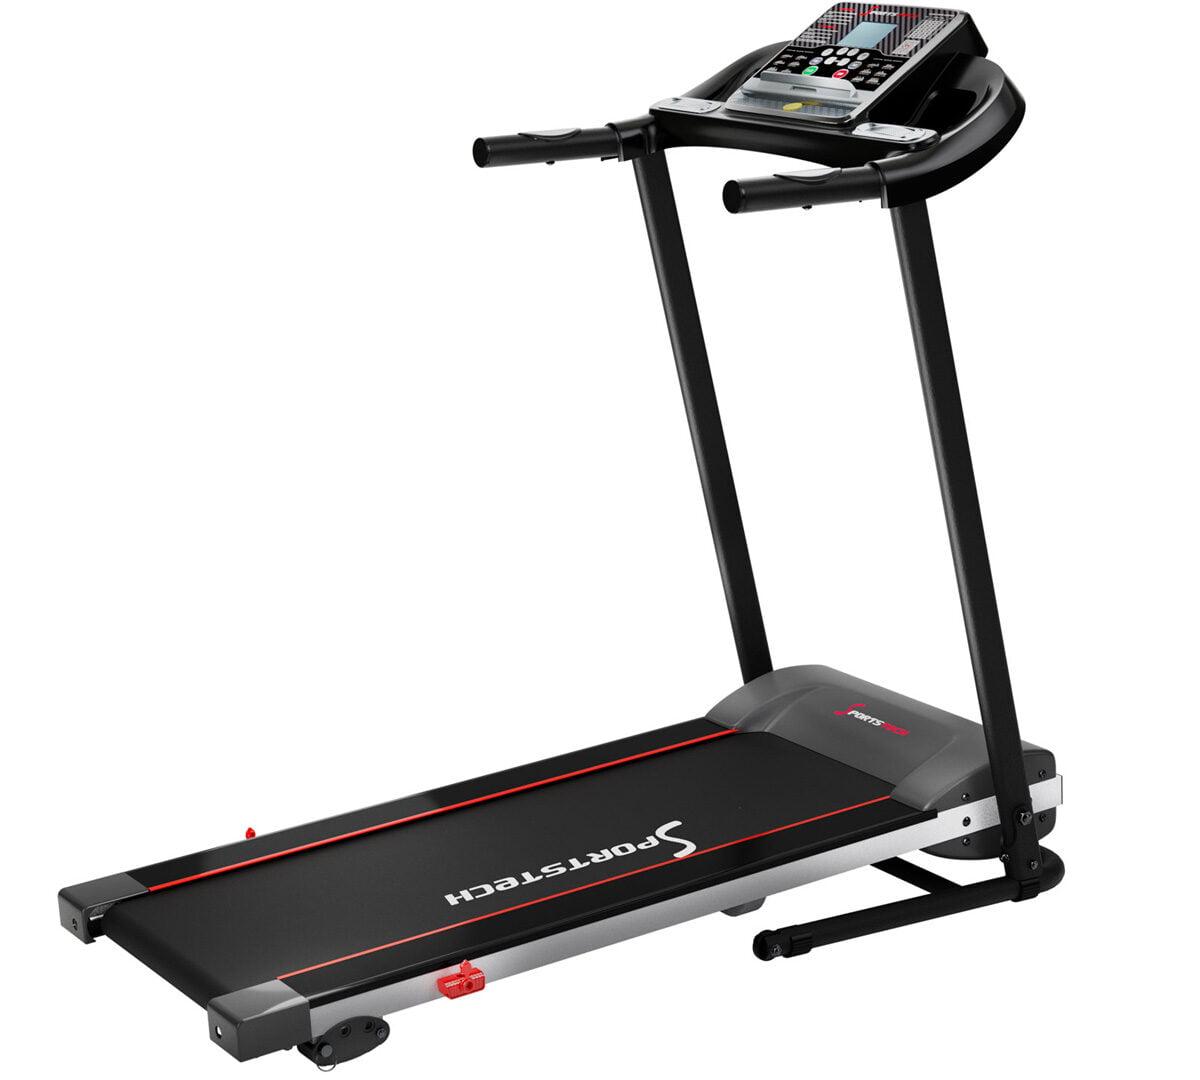 Sportstech F10 Treadmill Model 2020 review comparison